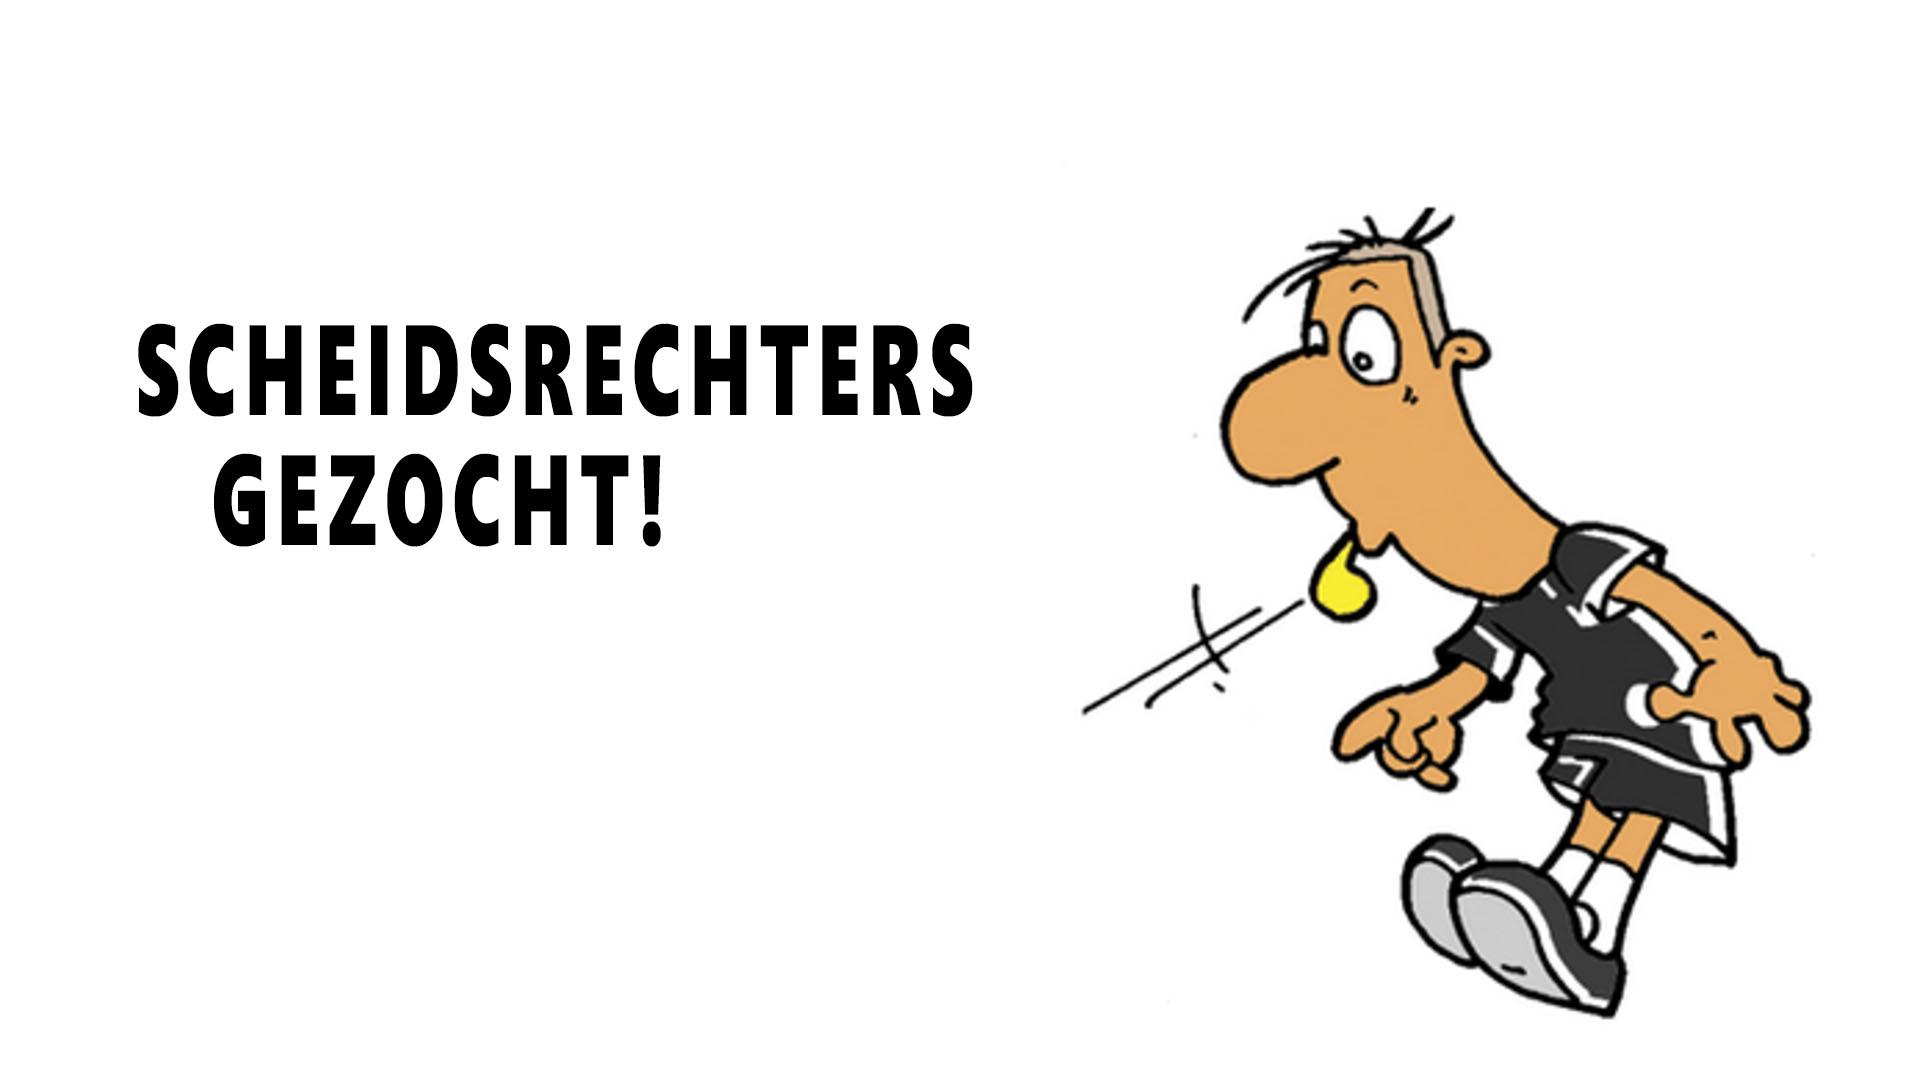 Scheidsrechters gezocht!